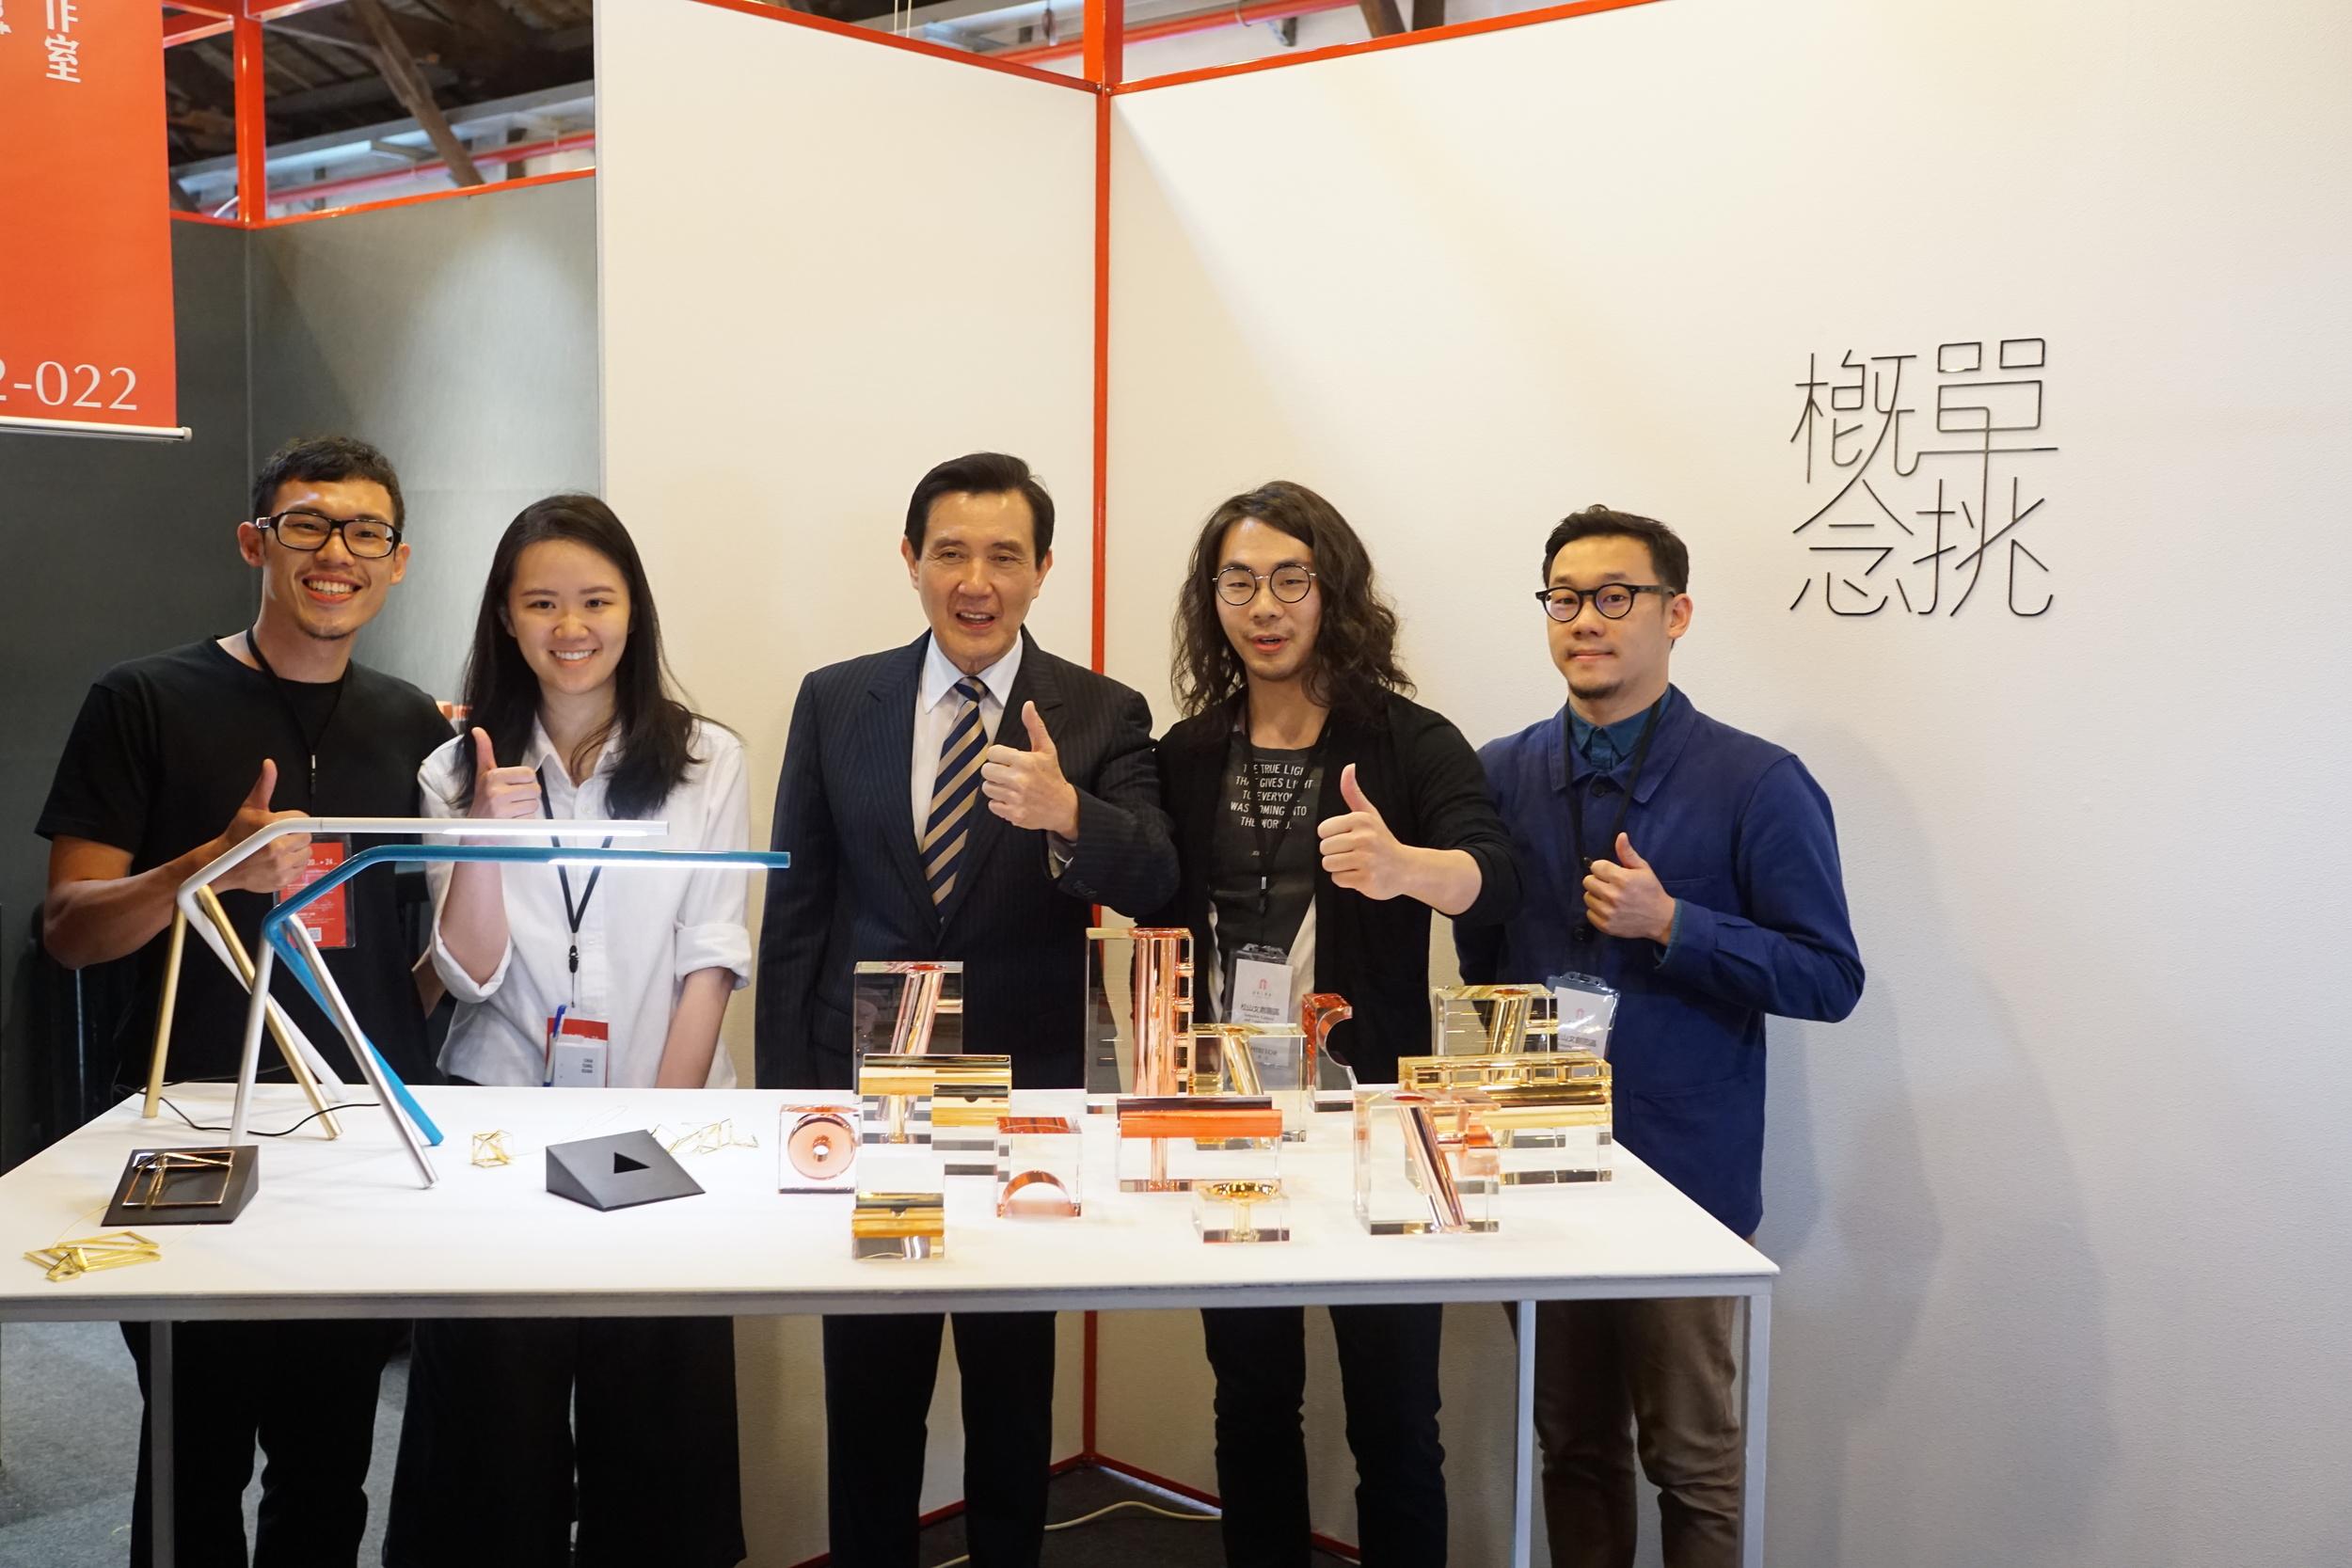 President Ma praised Singular Concept team for the creative energy.